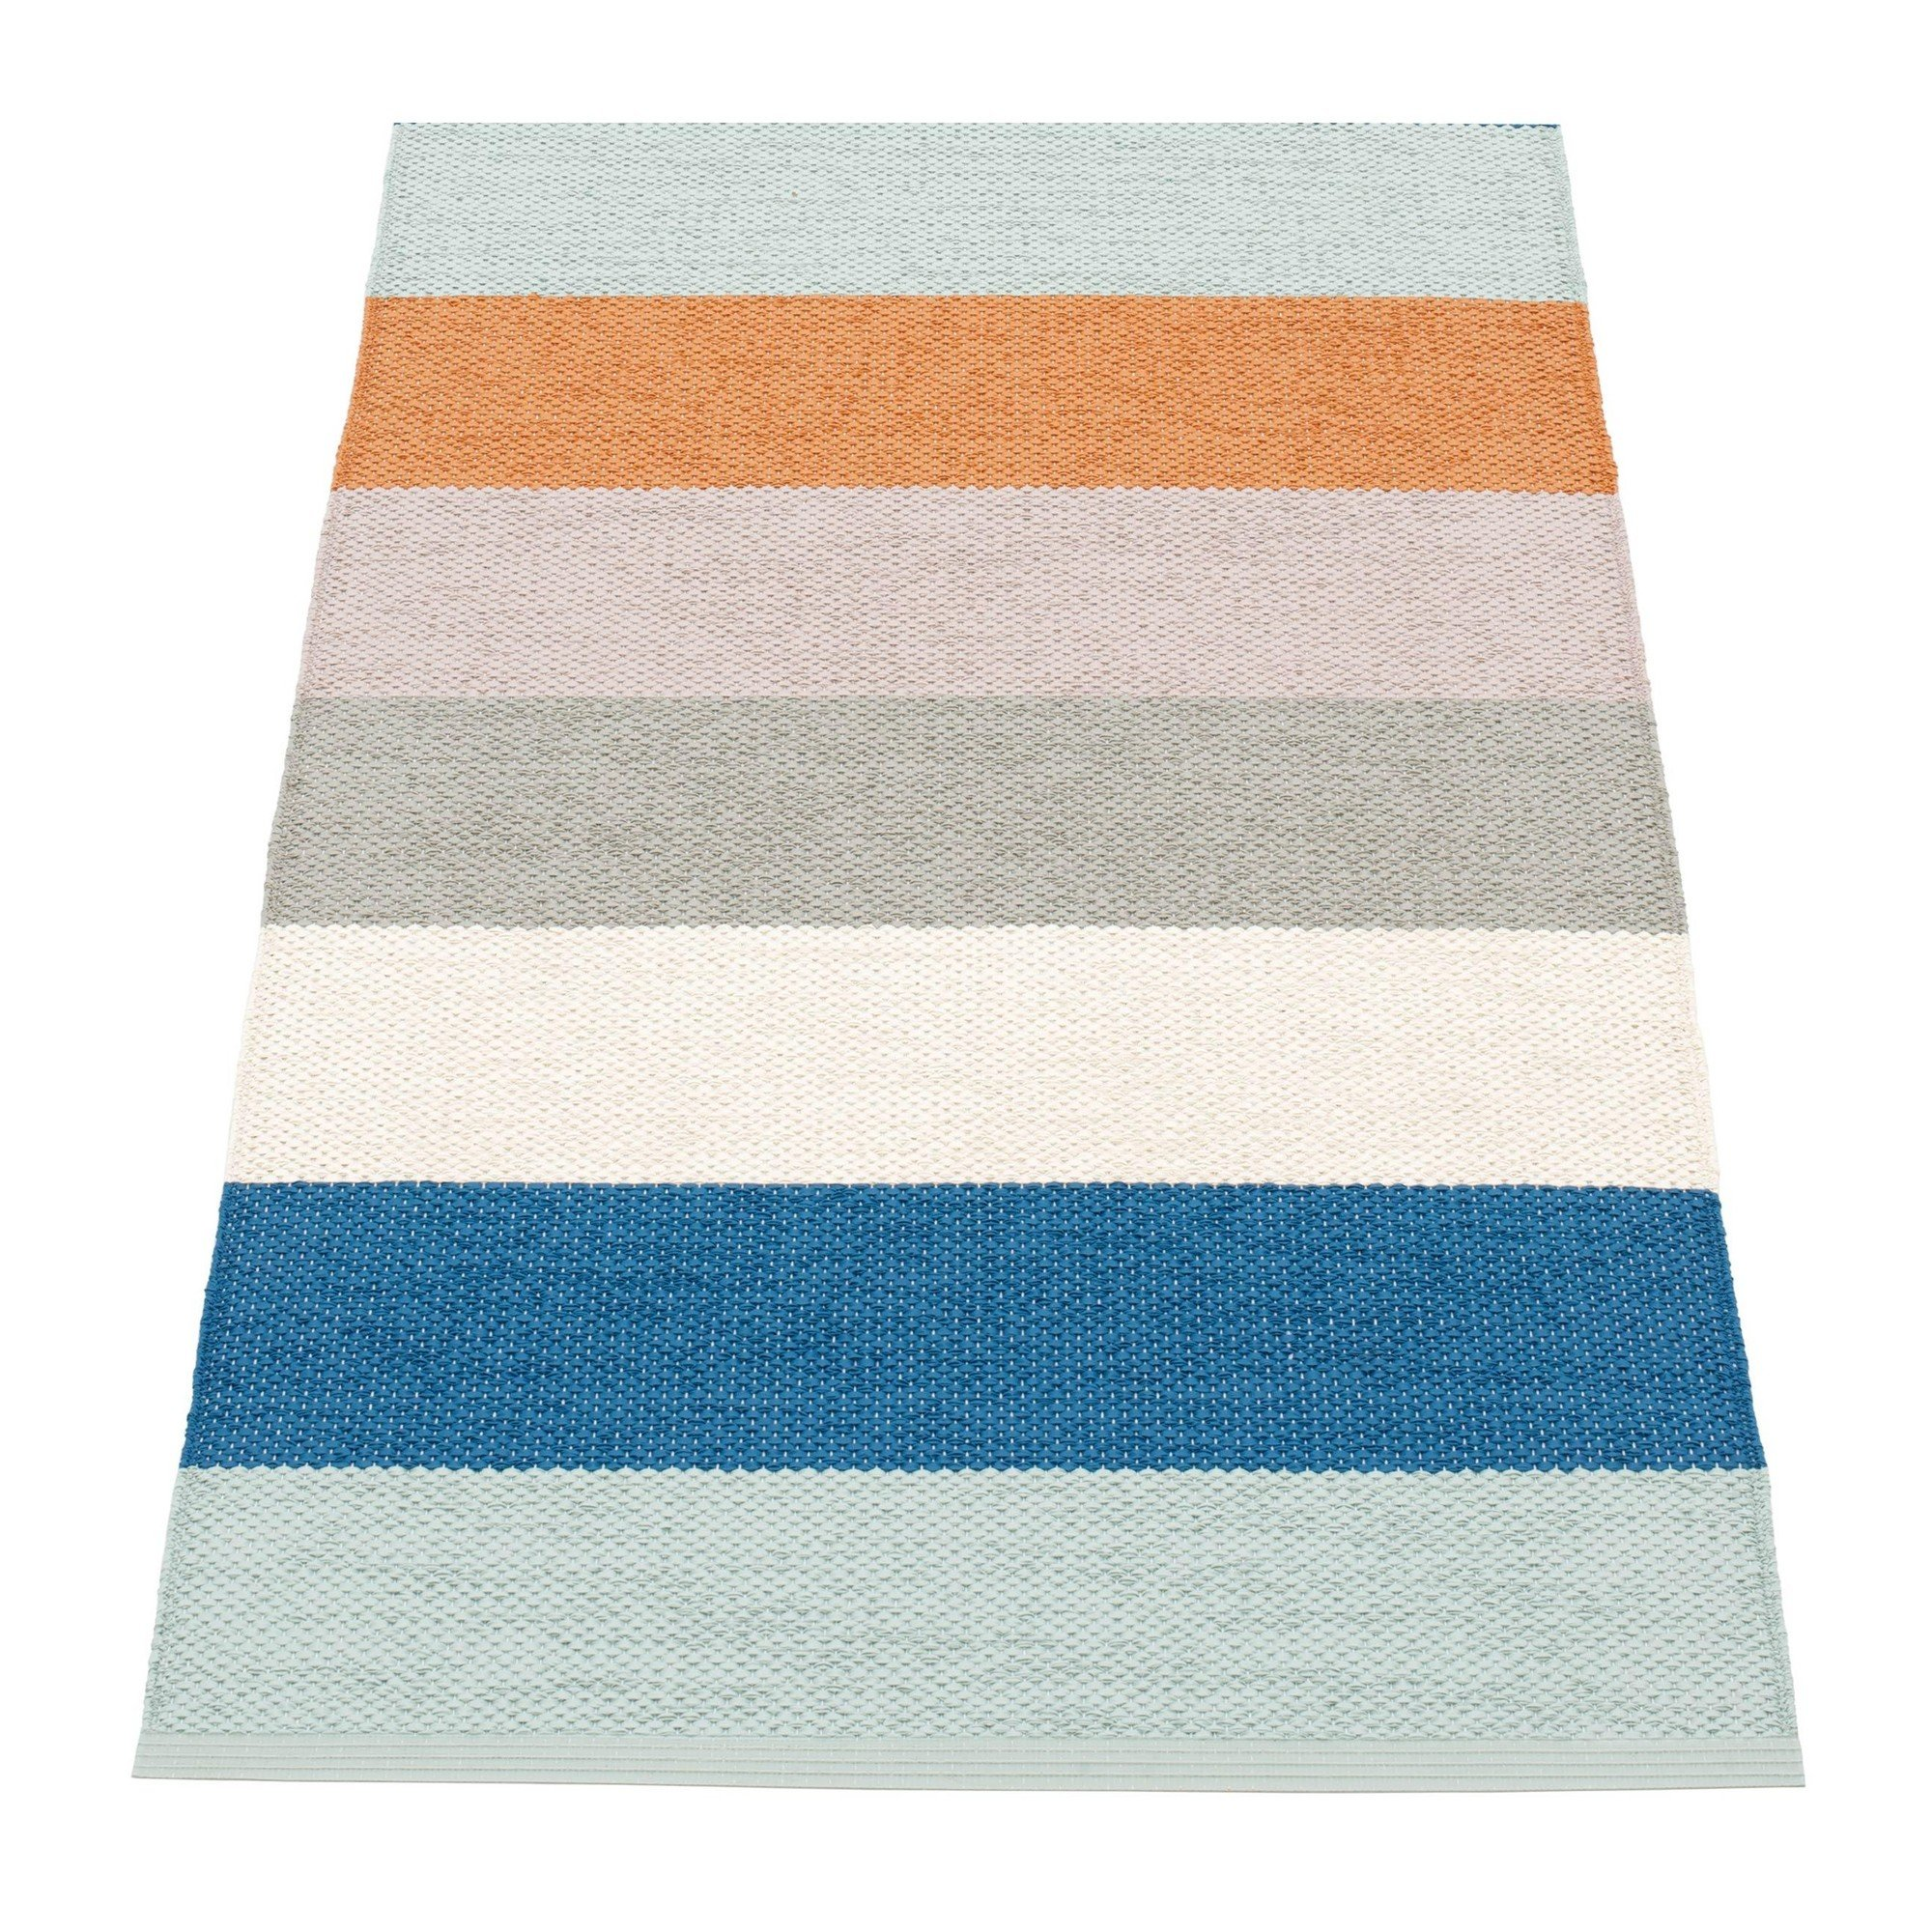 pappelina molly tapis pour l 39 ext rieur 70x100cm ambientedirect. Black Bedroom Furniture Sets. Home Design Ideas